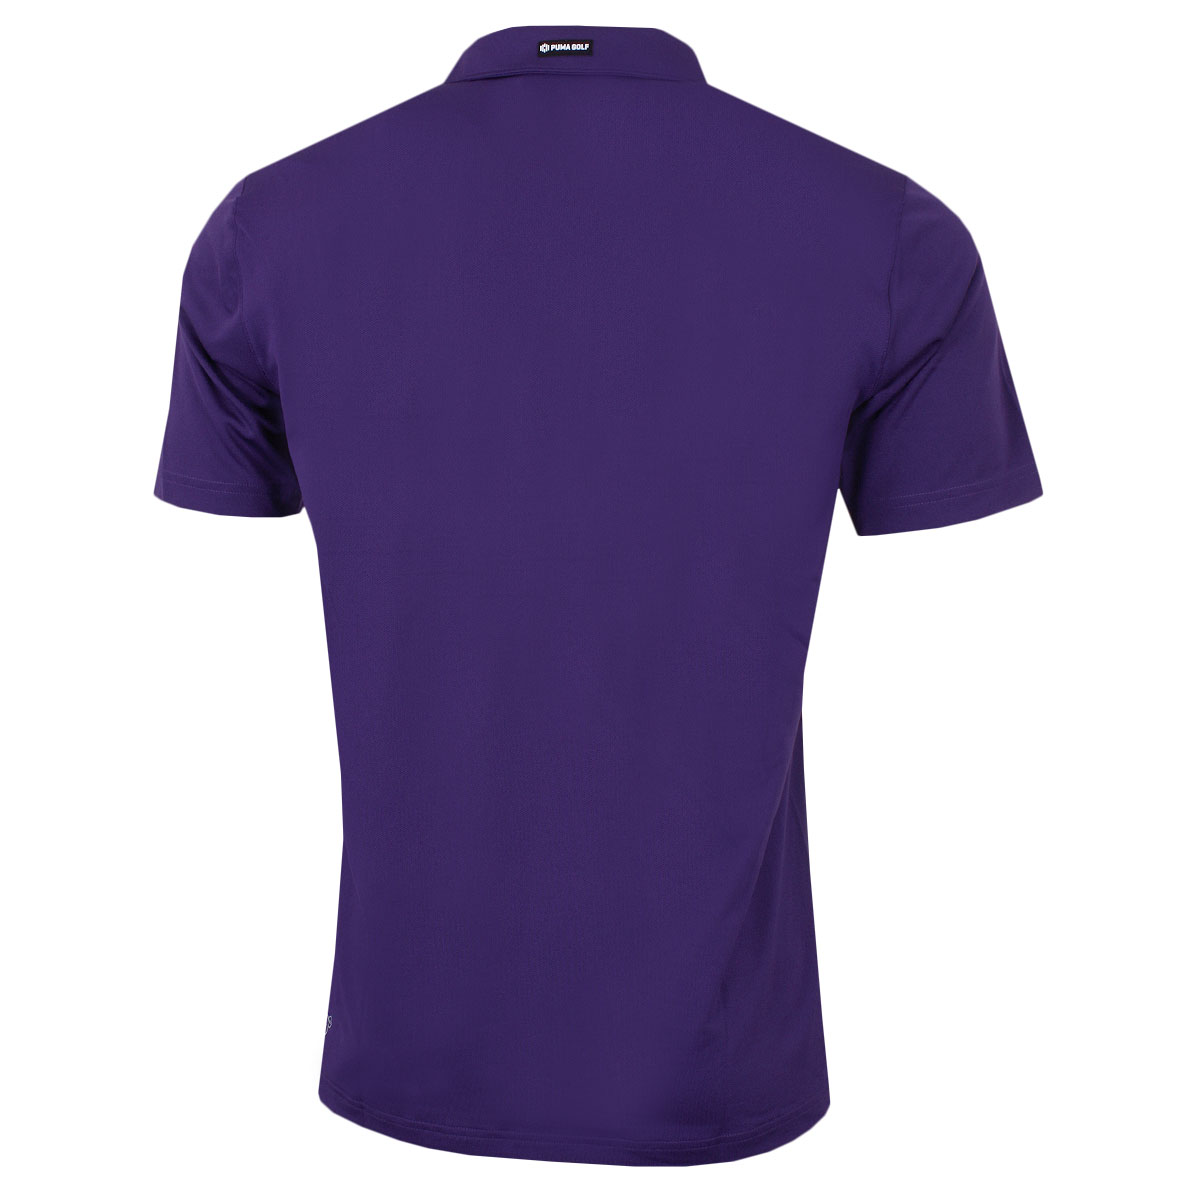 Puma-Golf-Mens-Essential-Pounce-Cresting-DryCell-Tech-Polo-Shirt-46-OFF-RRP thumbnail 25